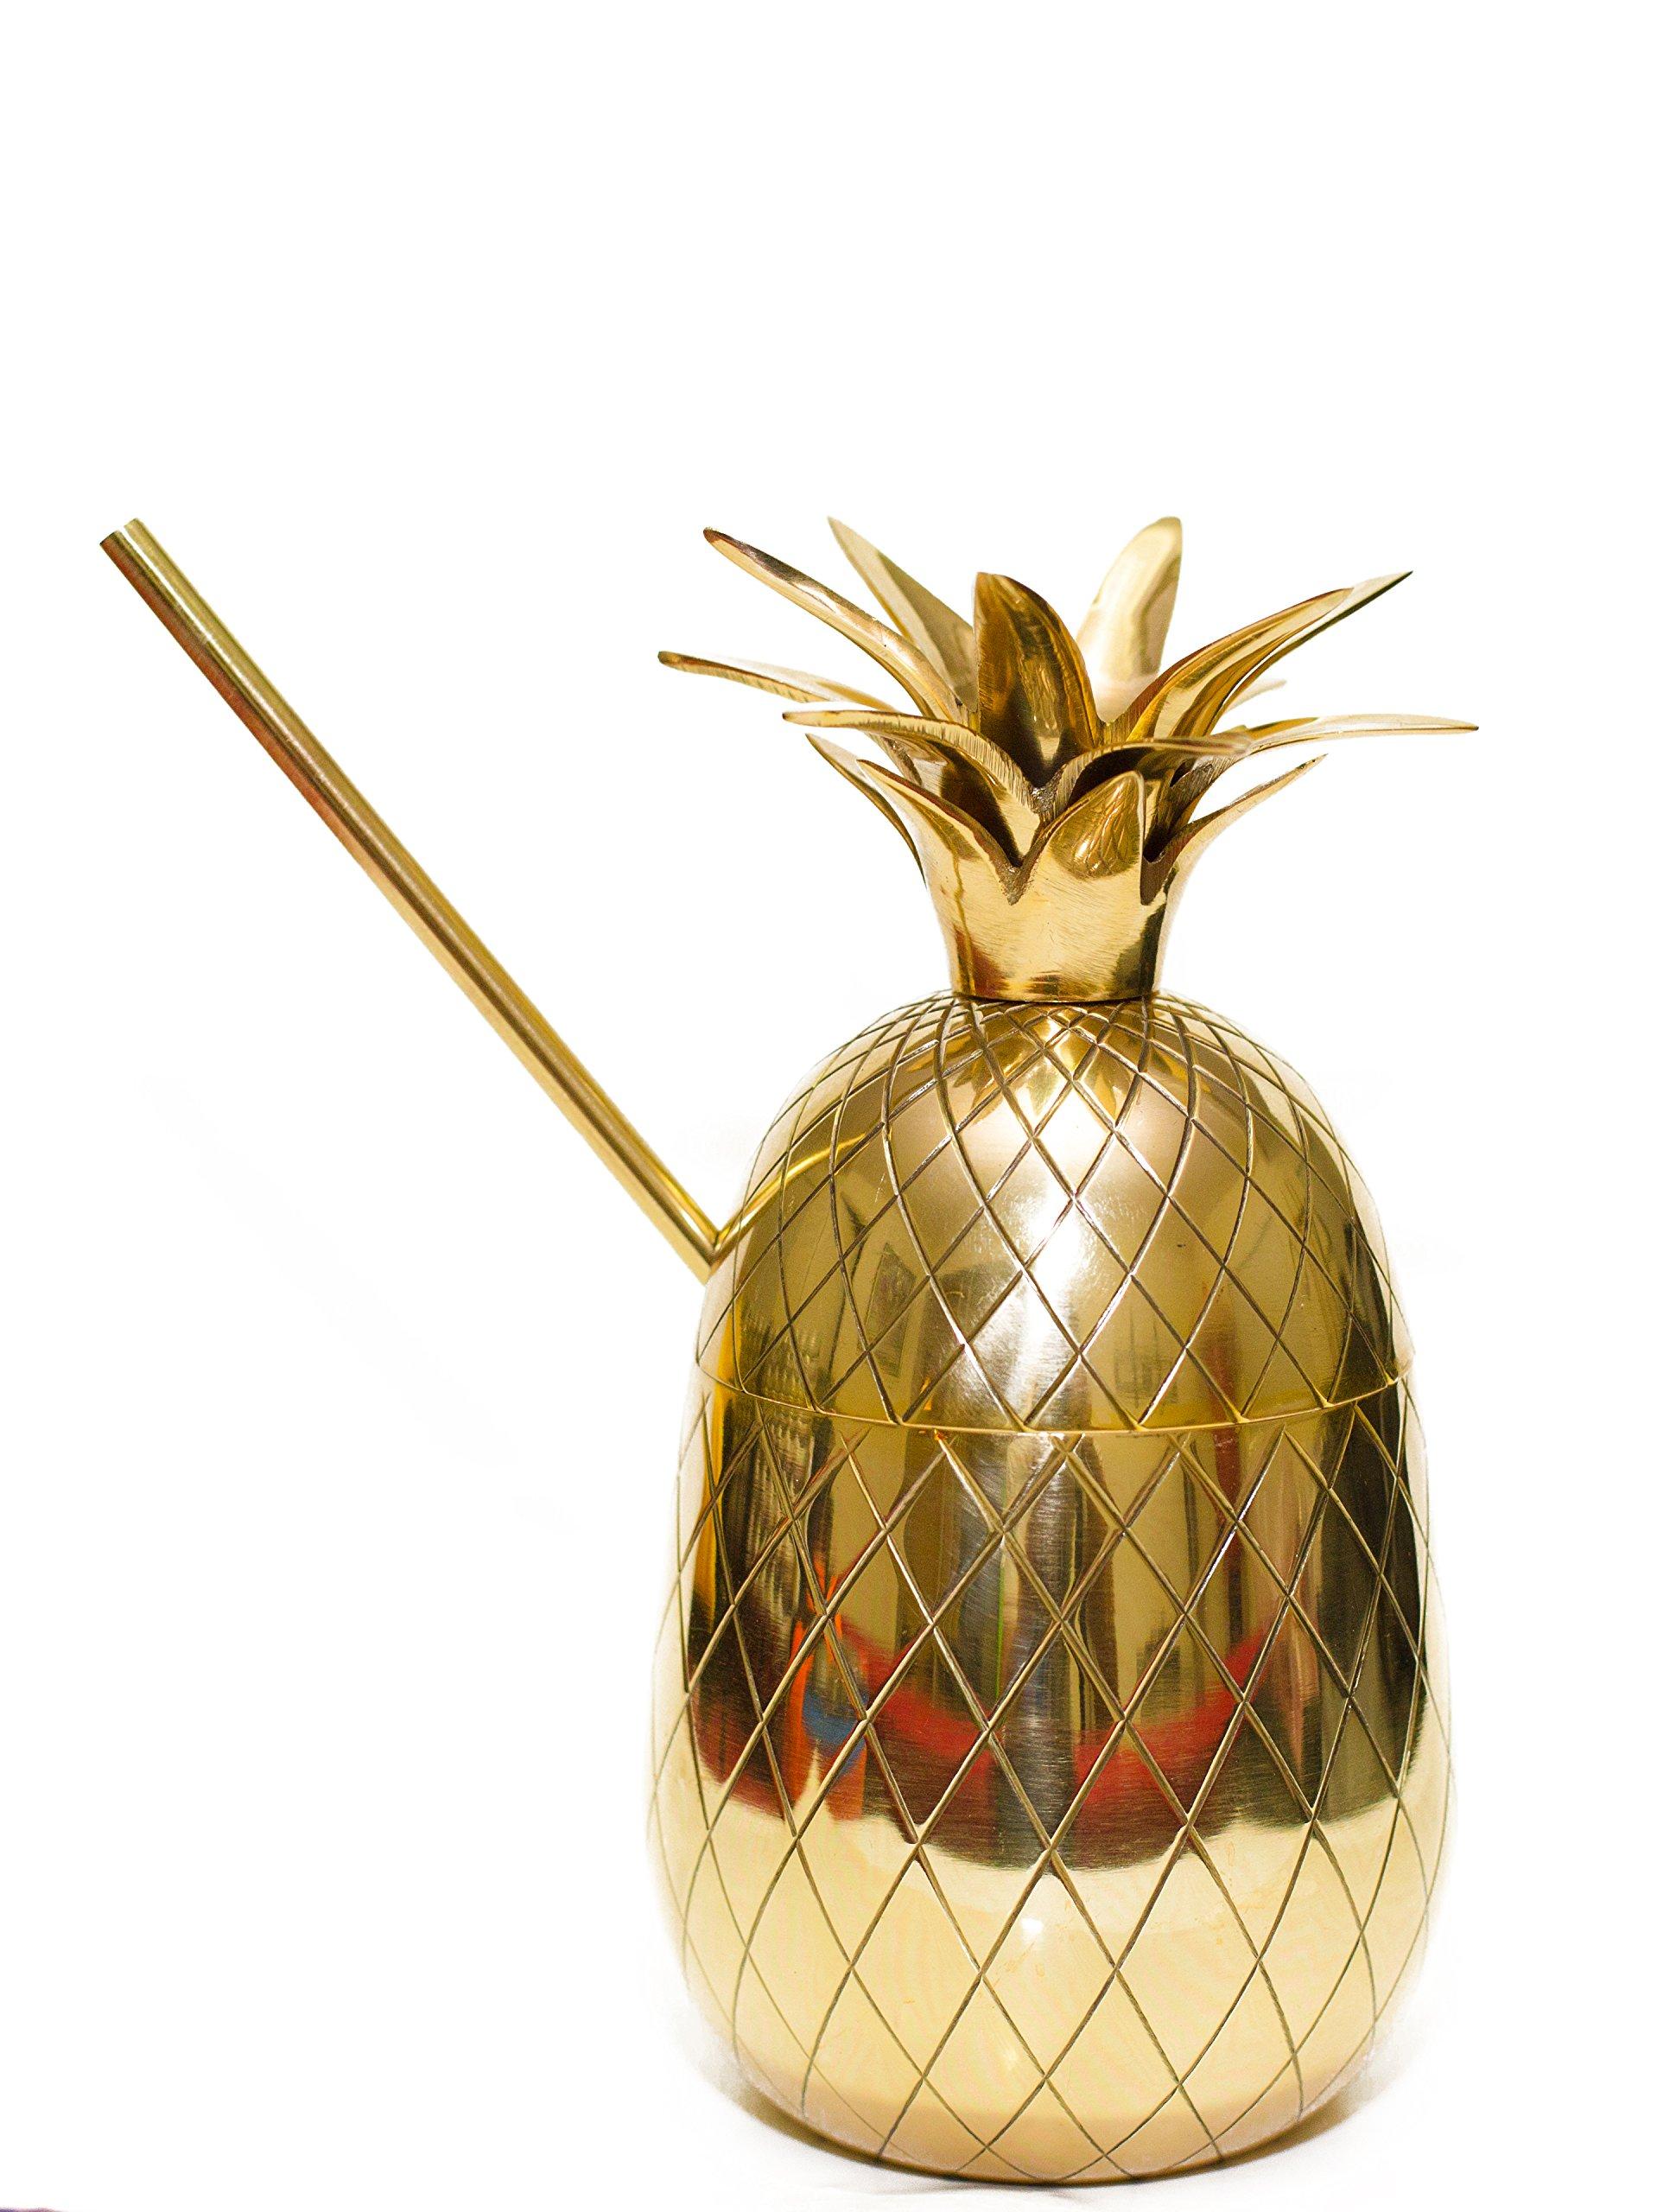 20oz Brass Pineapple Mug, Pineapple Cocktail Mug with Straw by Om Creation